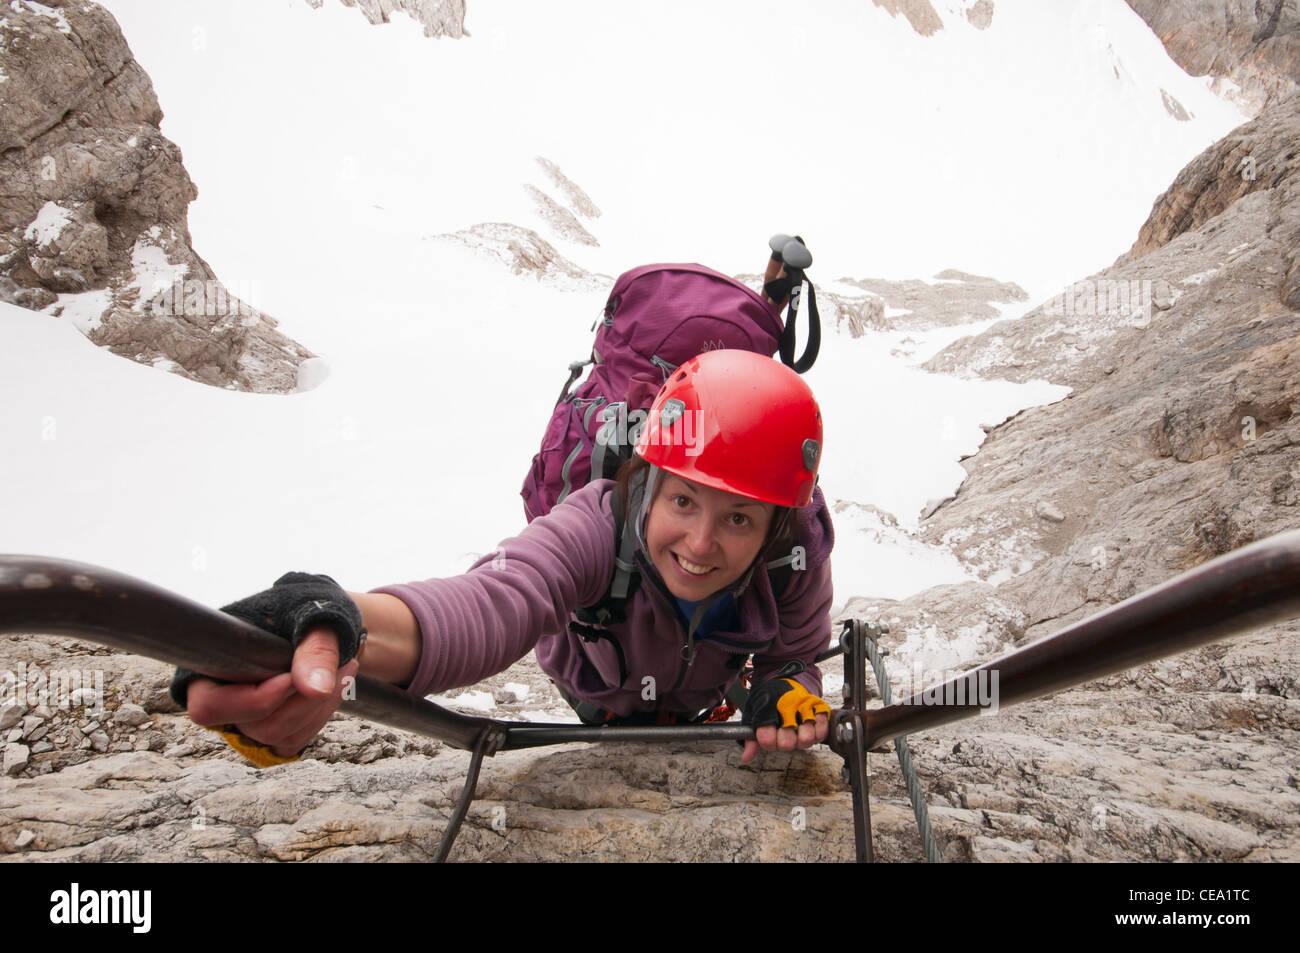 Klettersteig Leiter : Frau kletter leiter am klettersteig stockfoto bild: 43246908 alamy